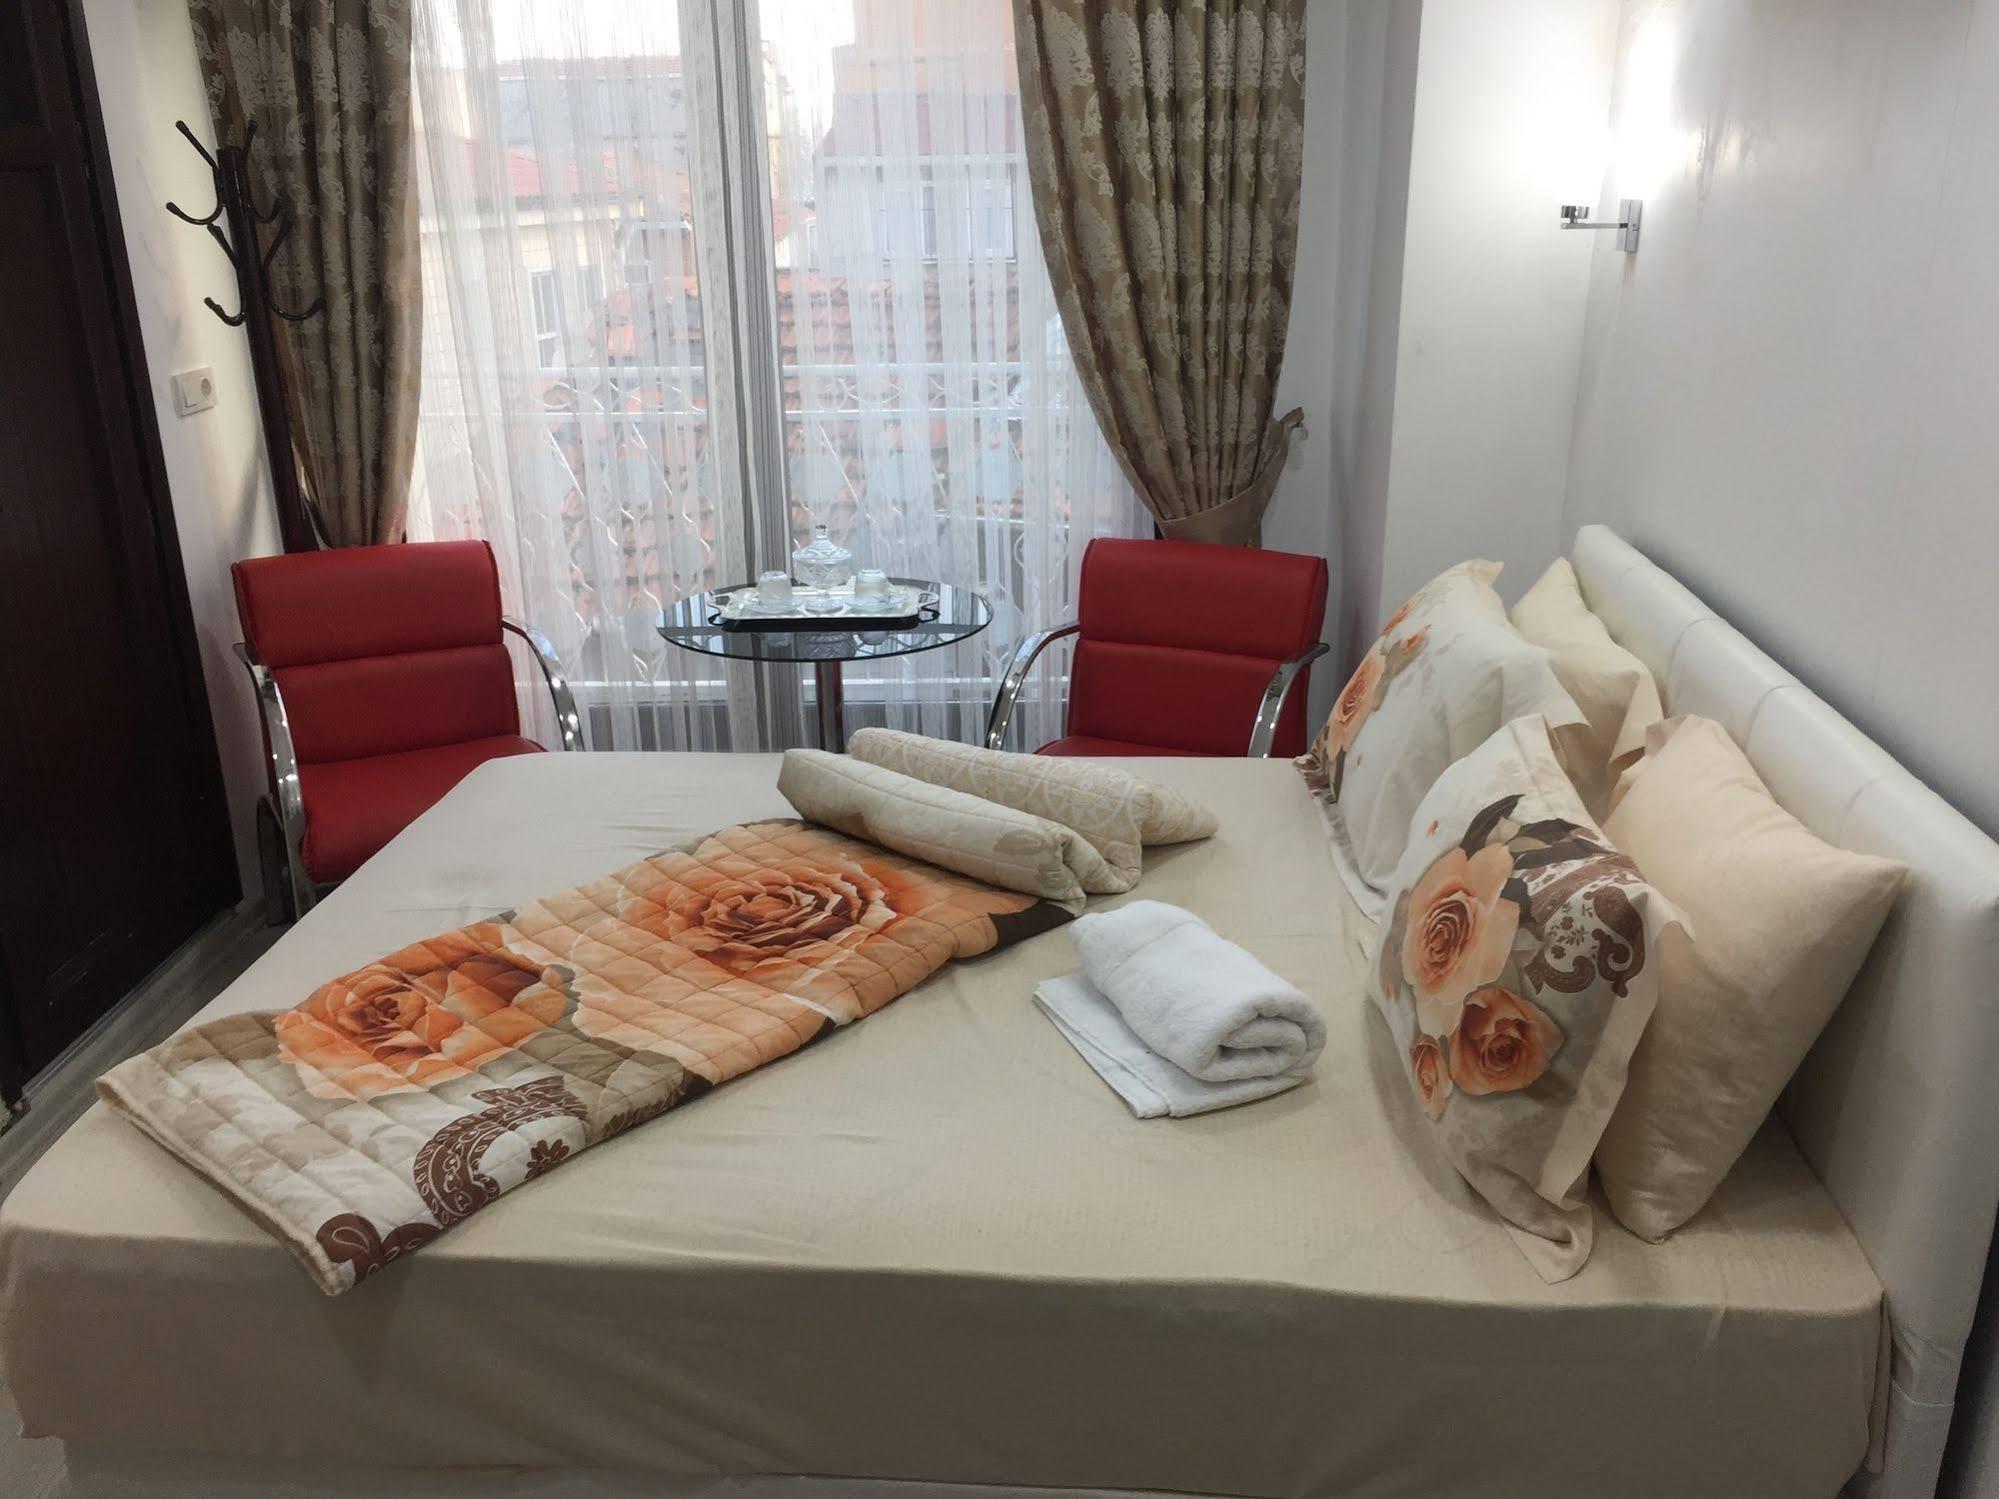 Sultanahmet Deluxe Hotel